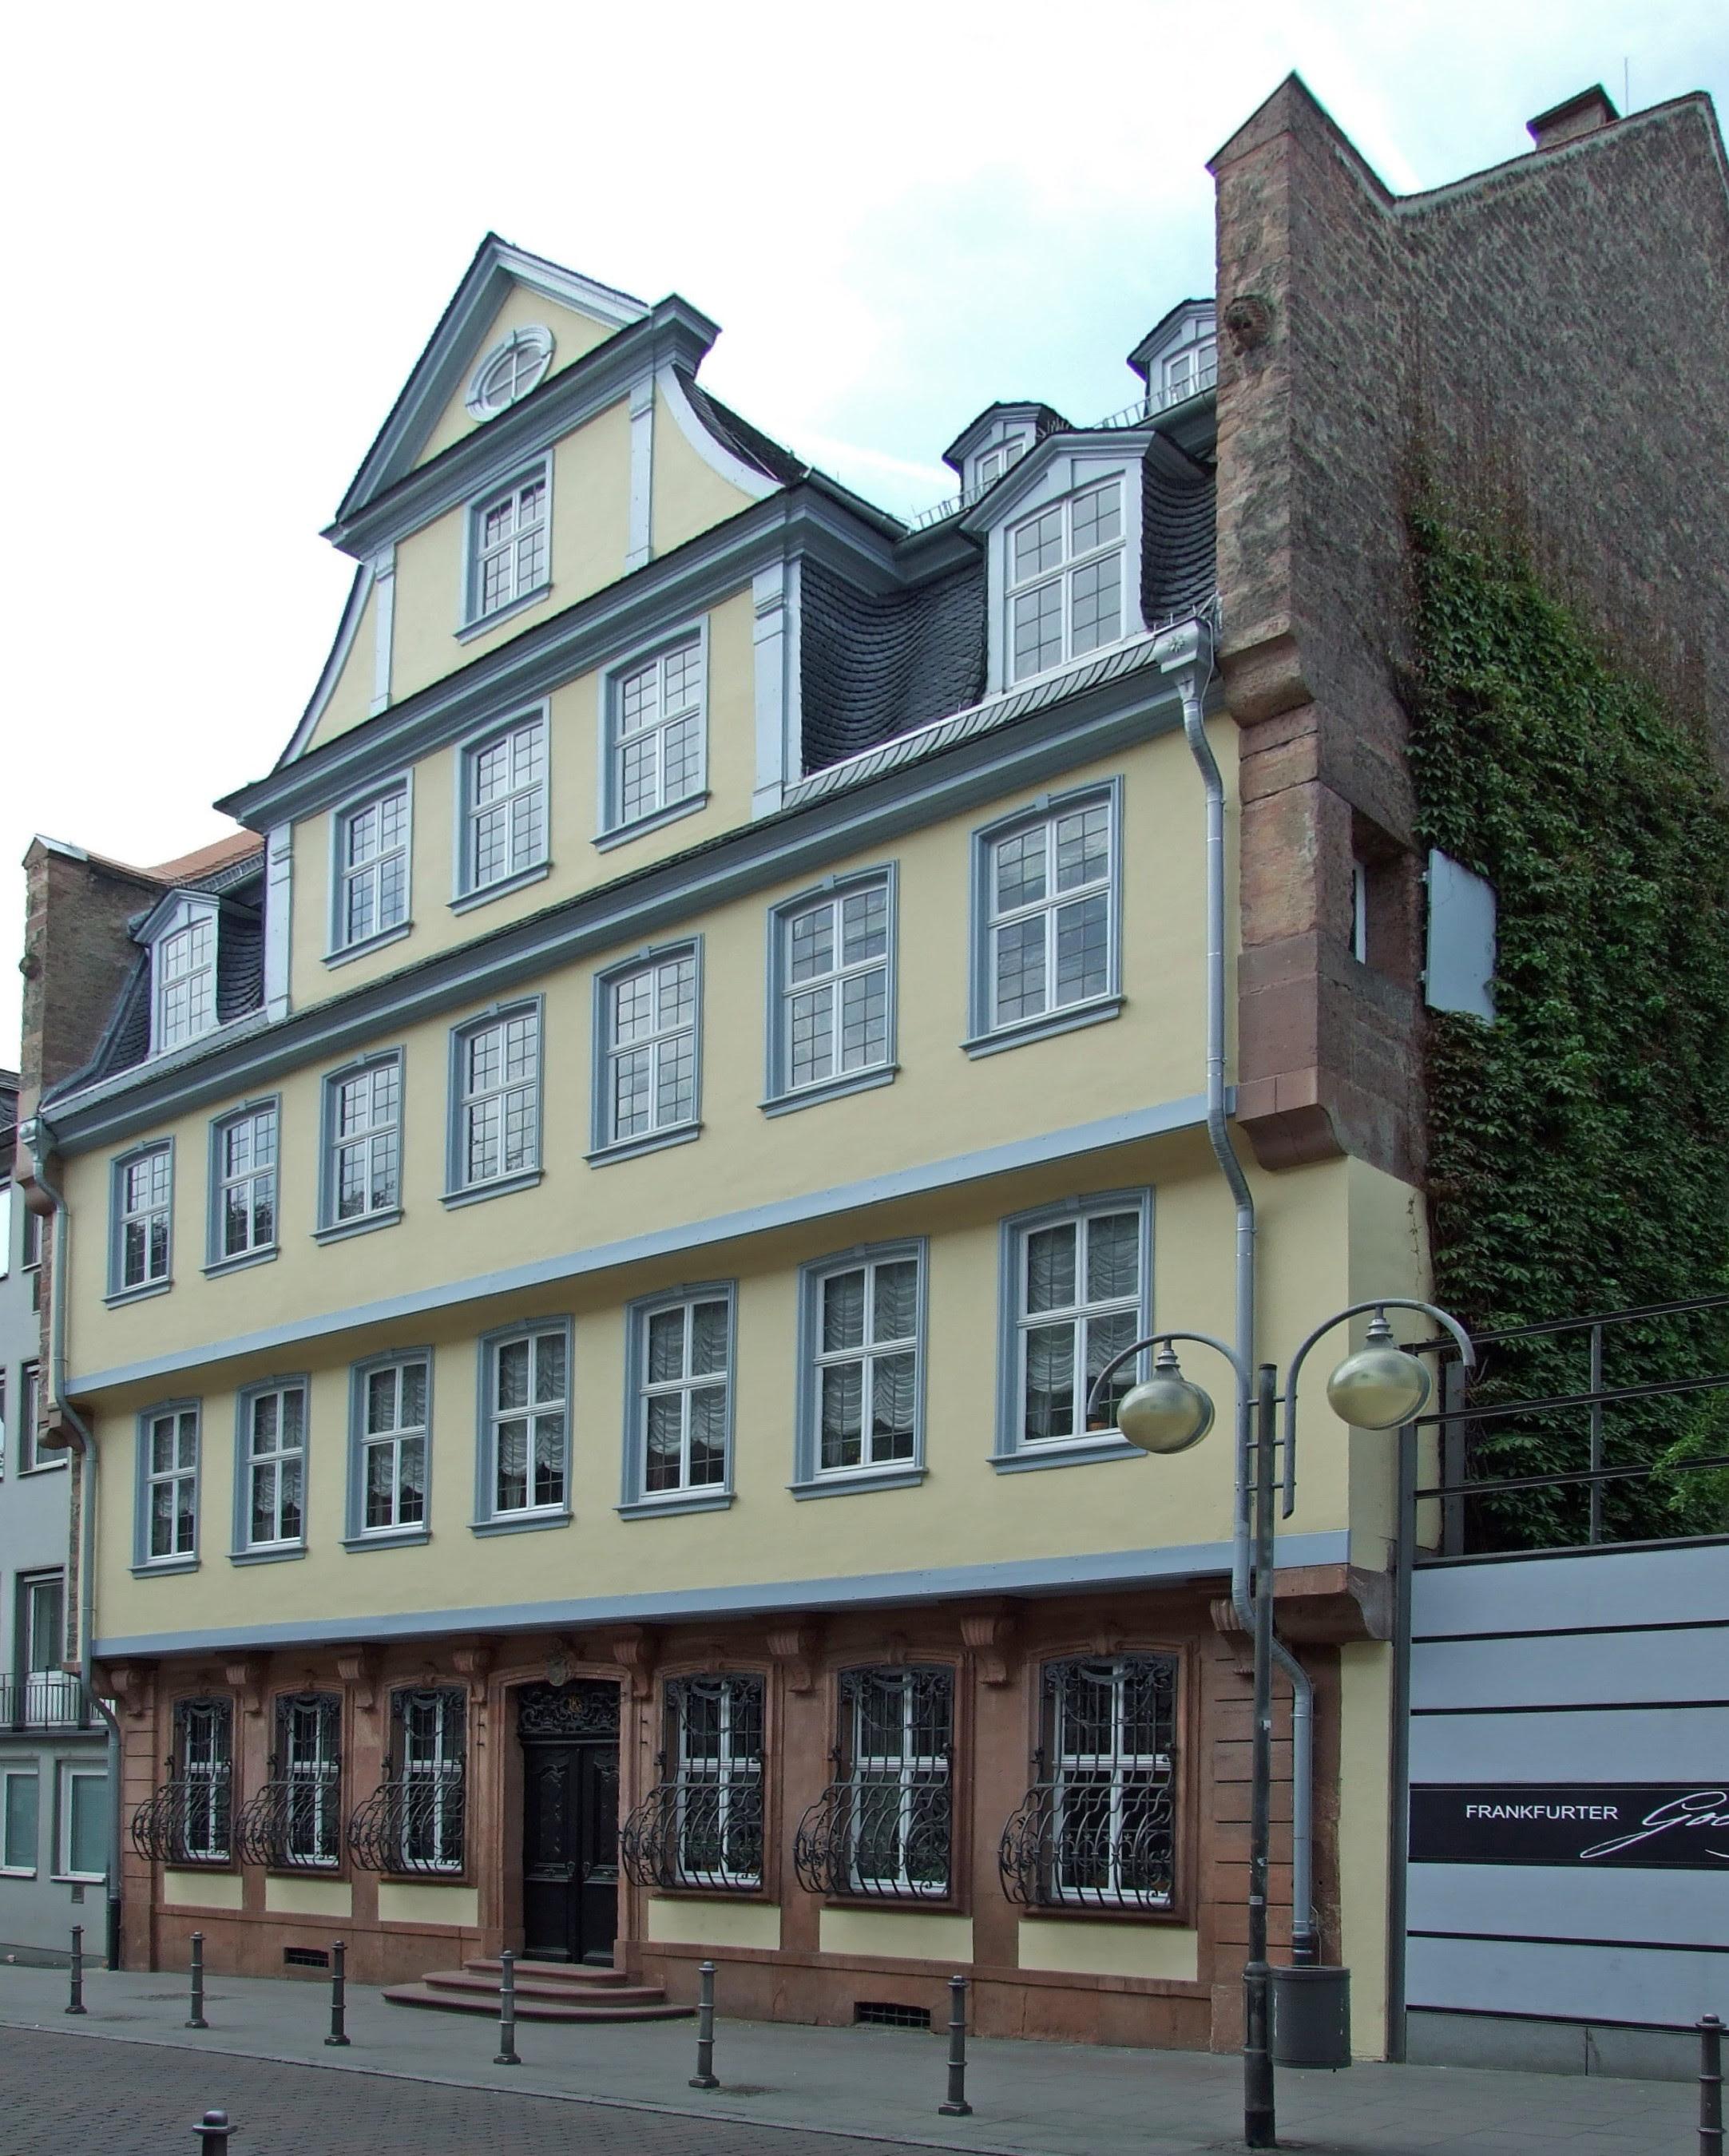 Goethe House in Frankfurt am Main